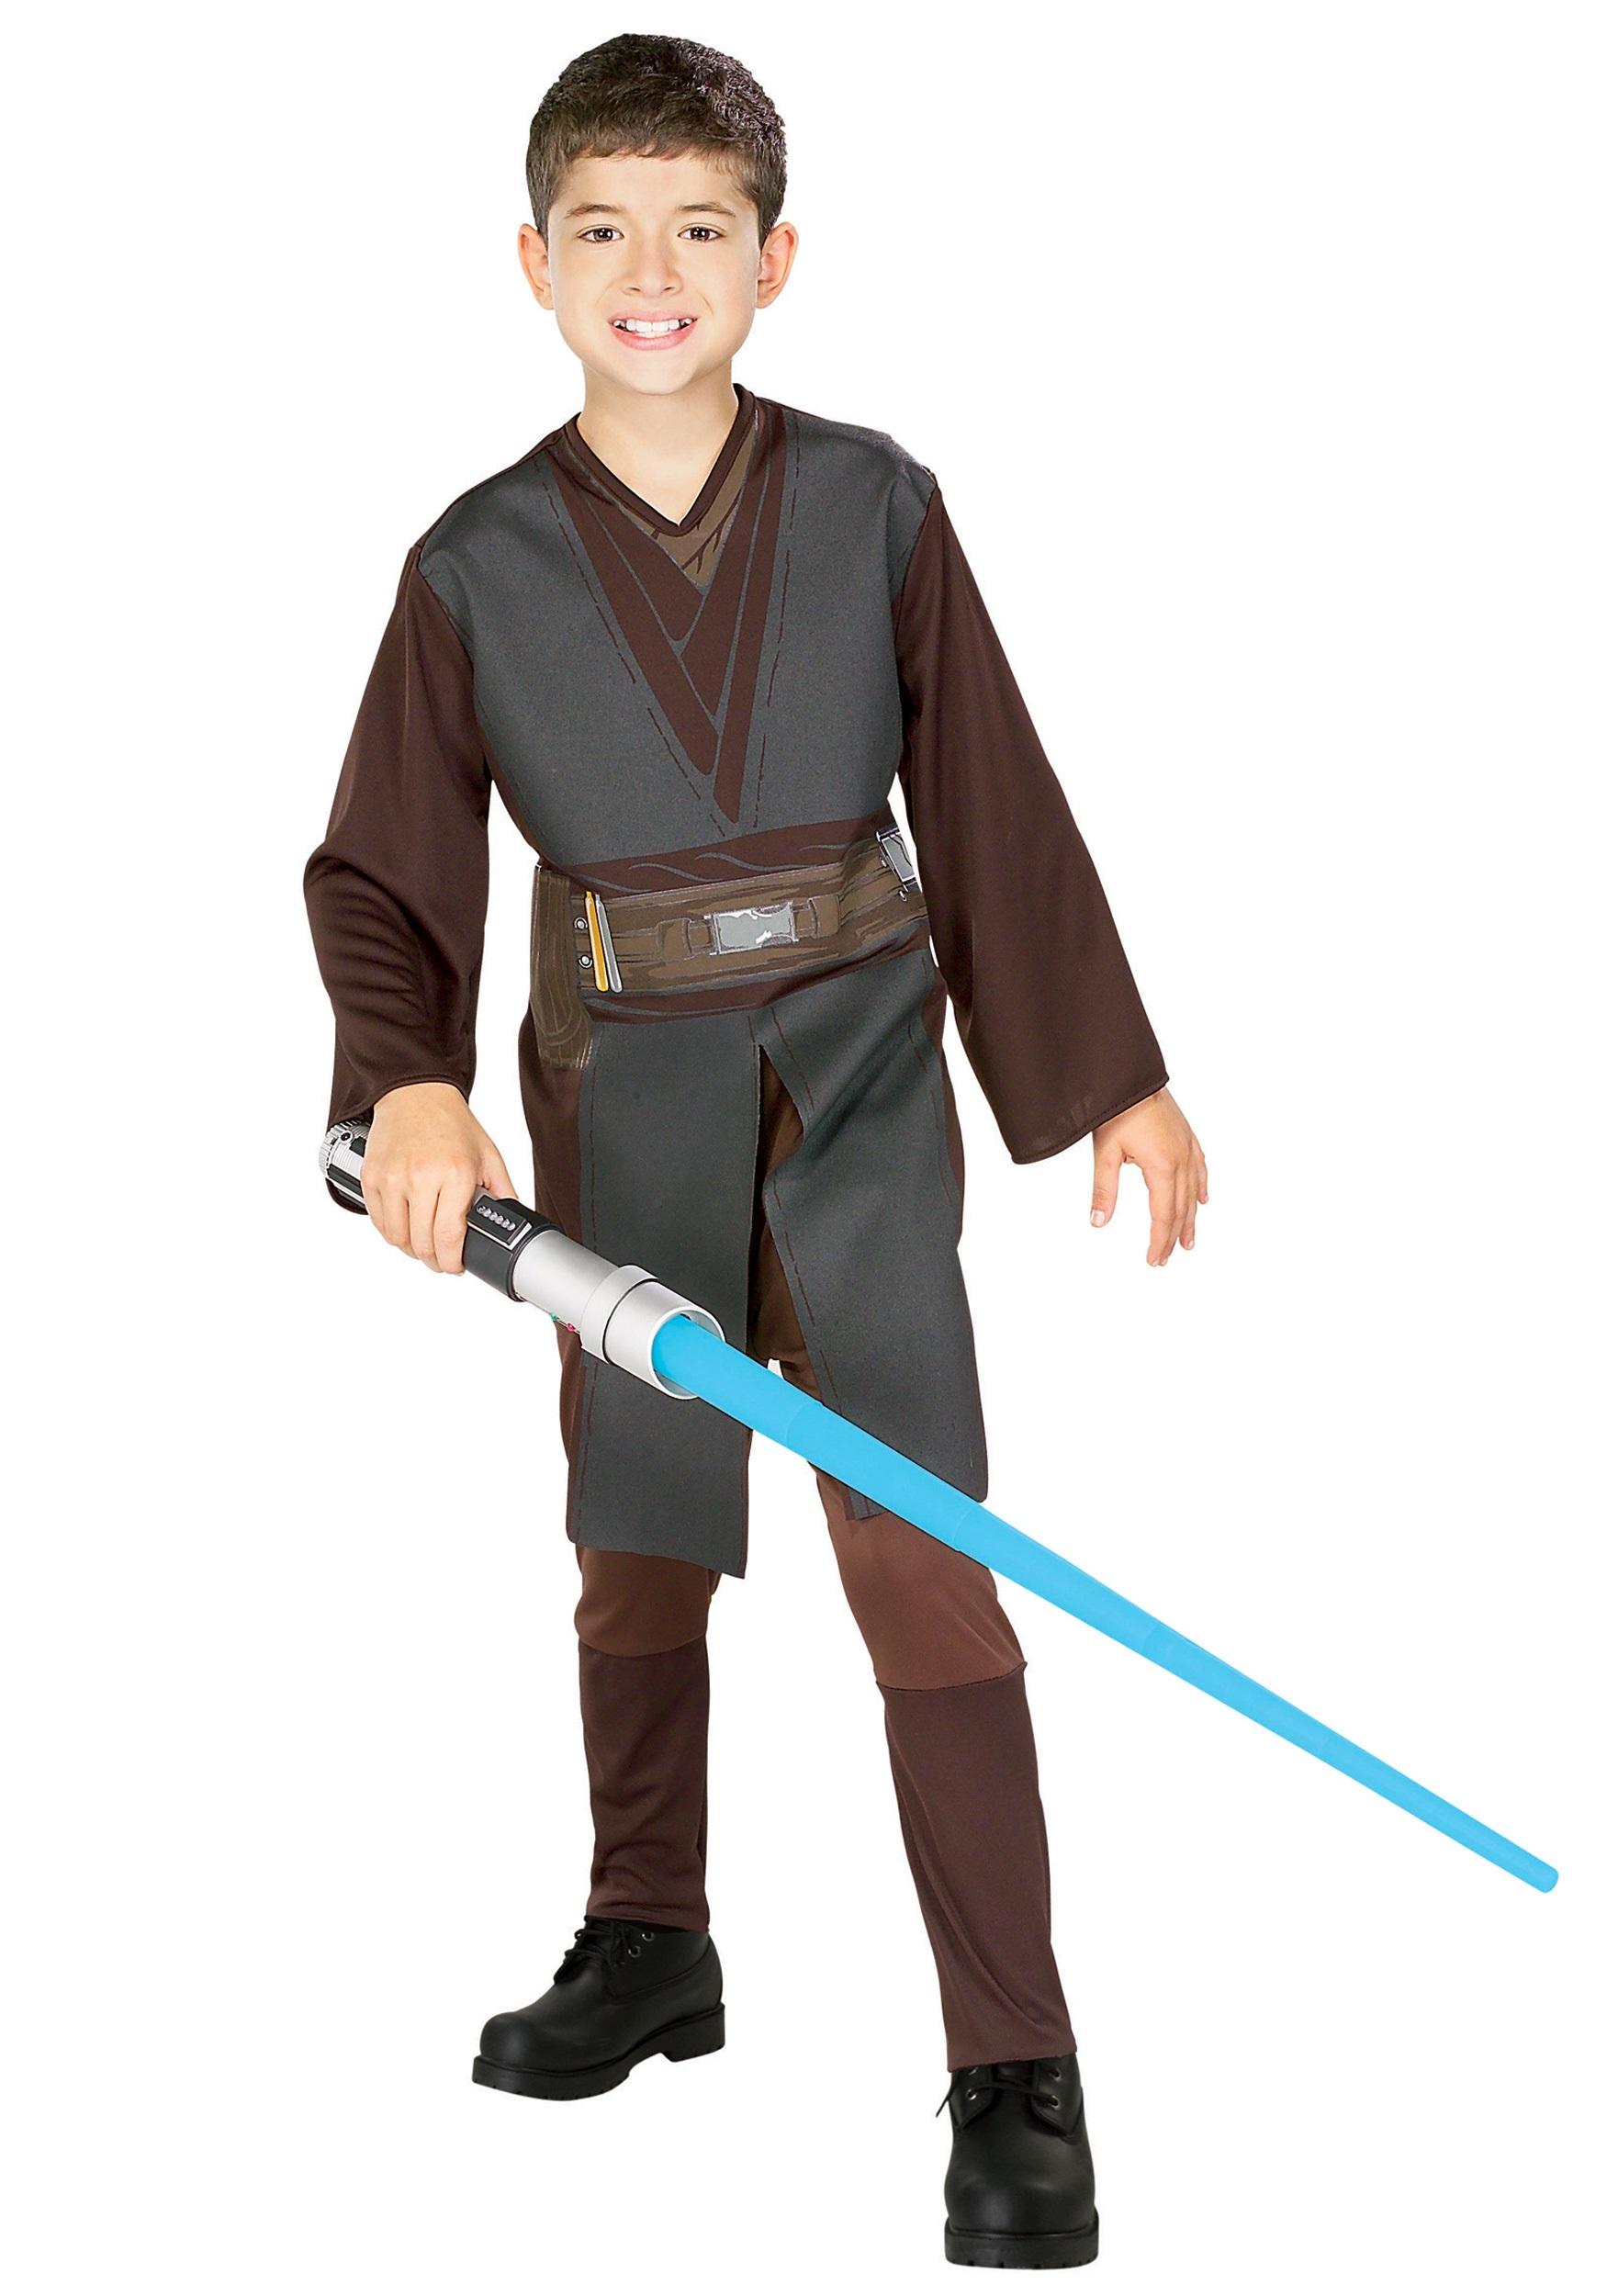 sc 1 st  Fun.com & Revenge of the Sith Kidsu0027 Anakin Skywalker Costume